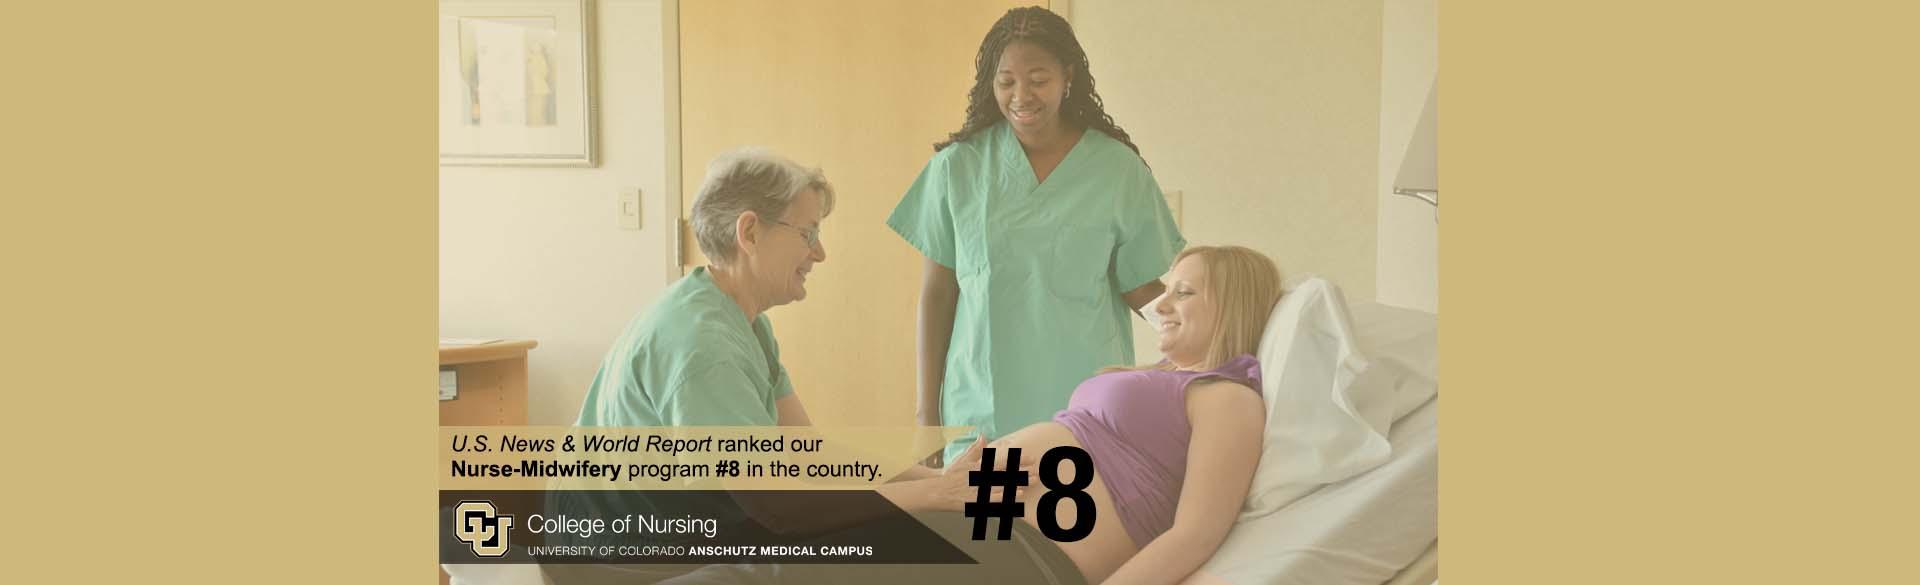 U.S. News ranking CU Nursing's Master's in Nursing program in the top 10% nationwide